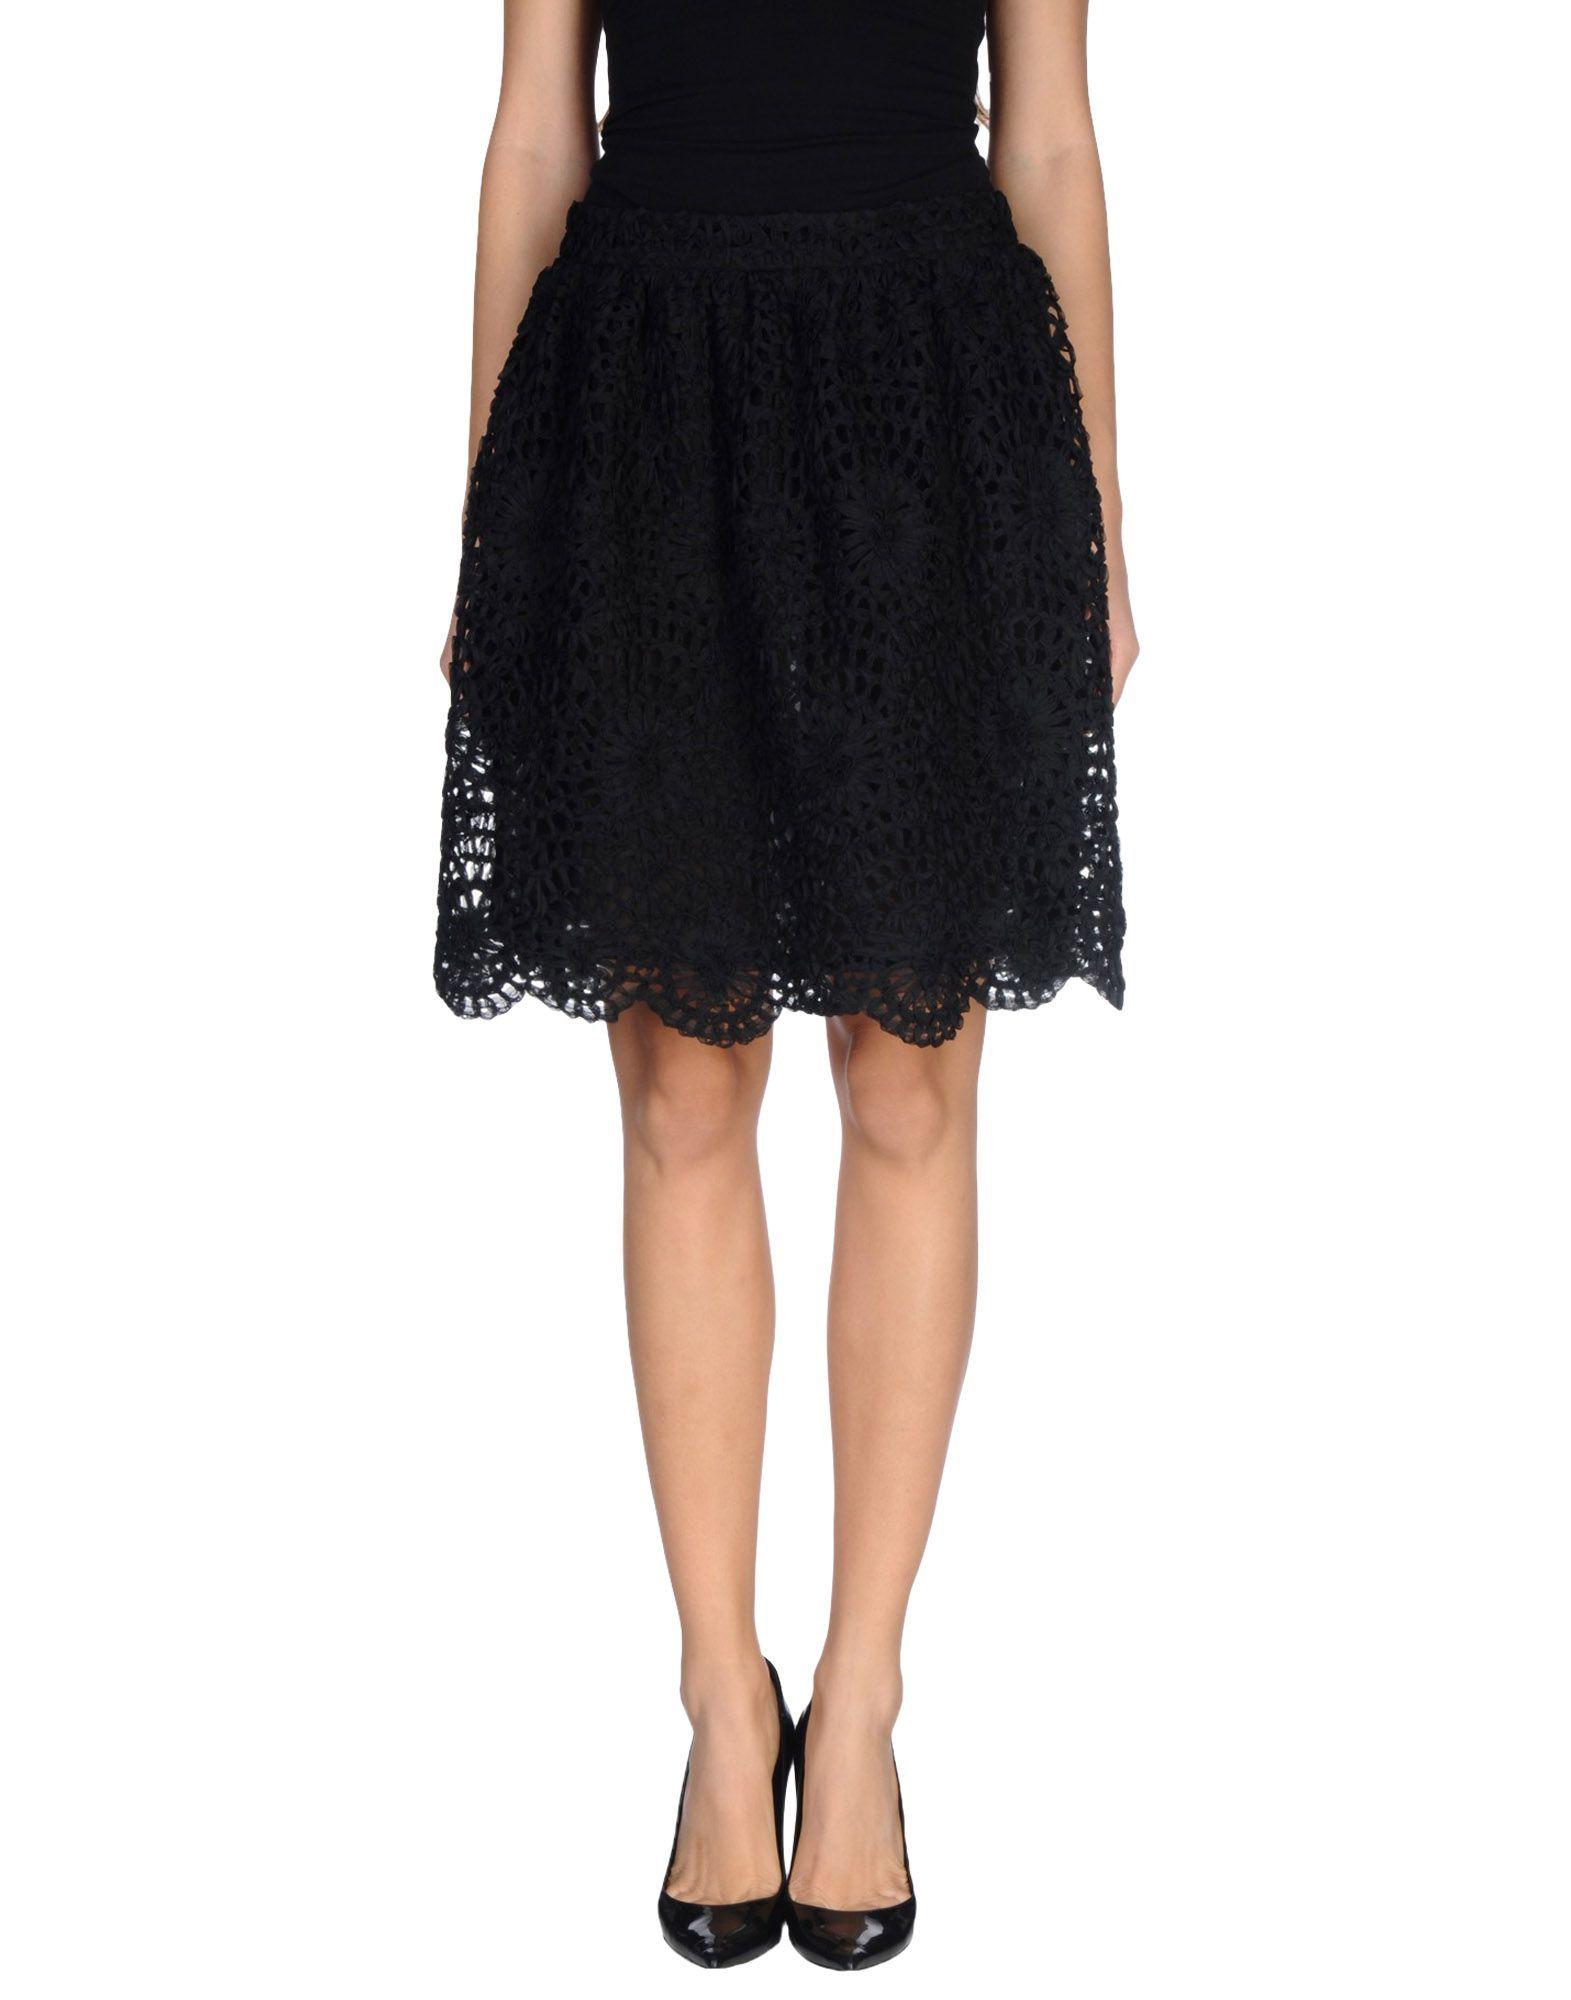 L' Autre Chose Black Knee Length Skirt